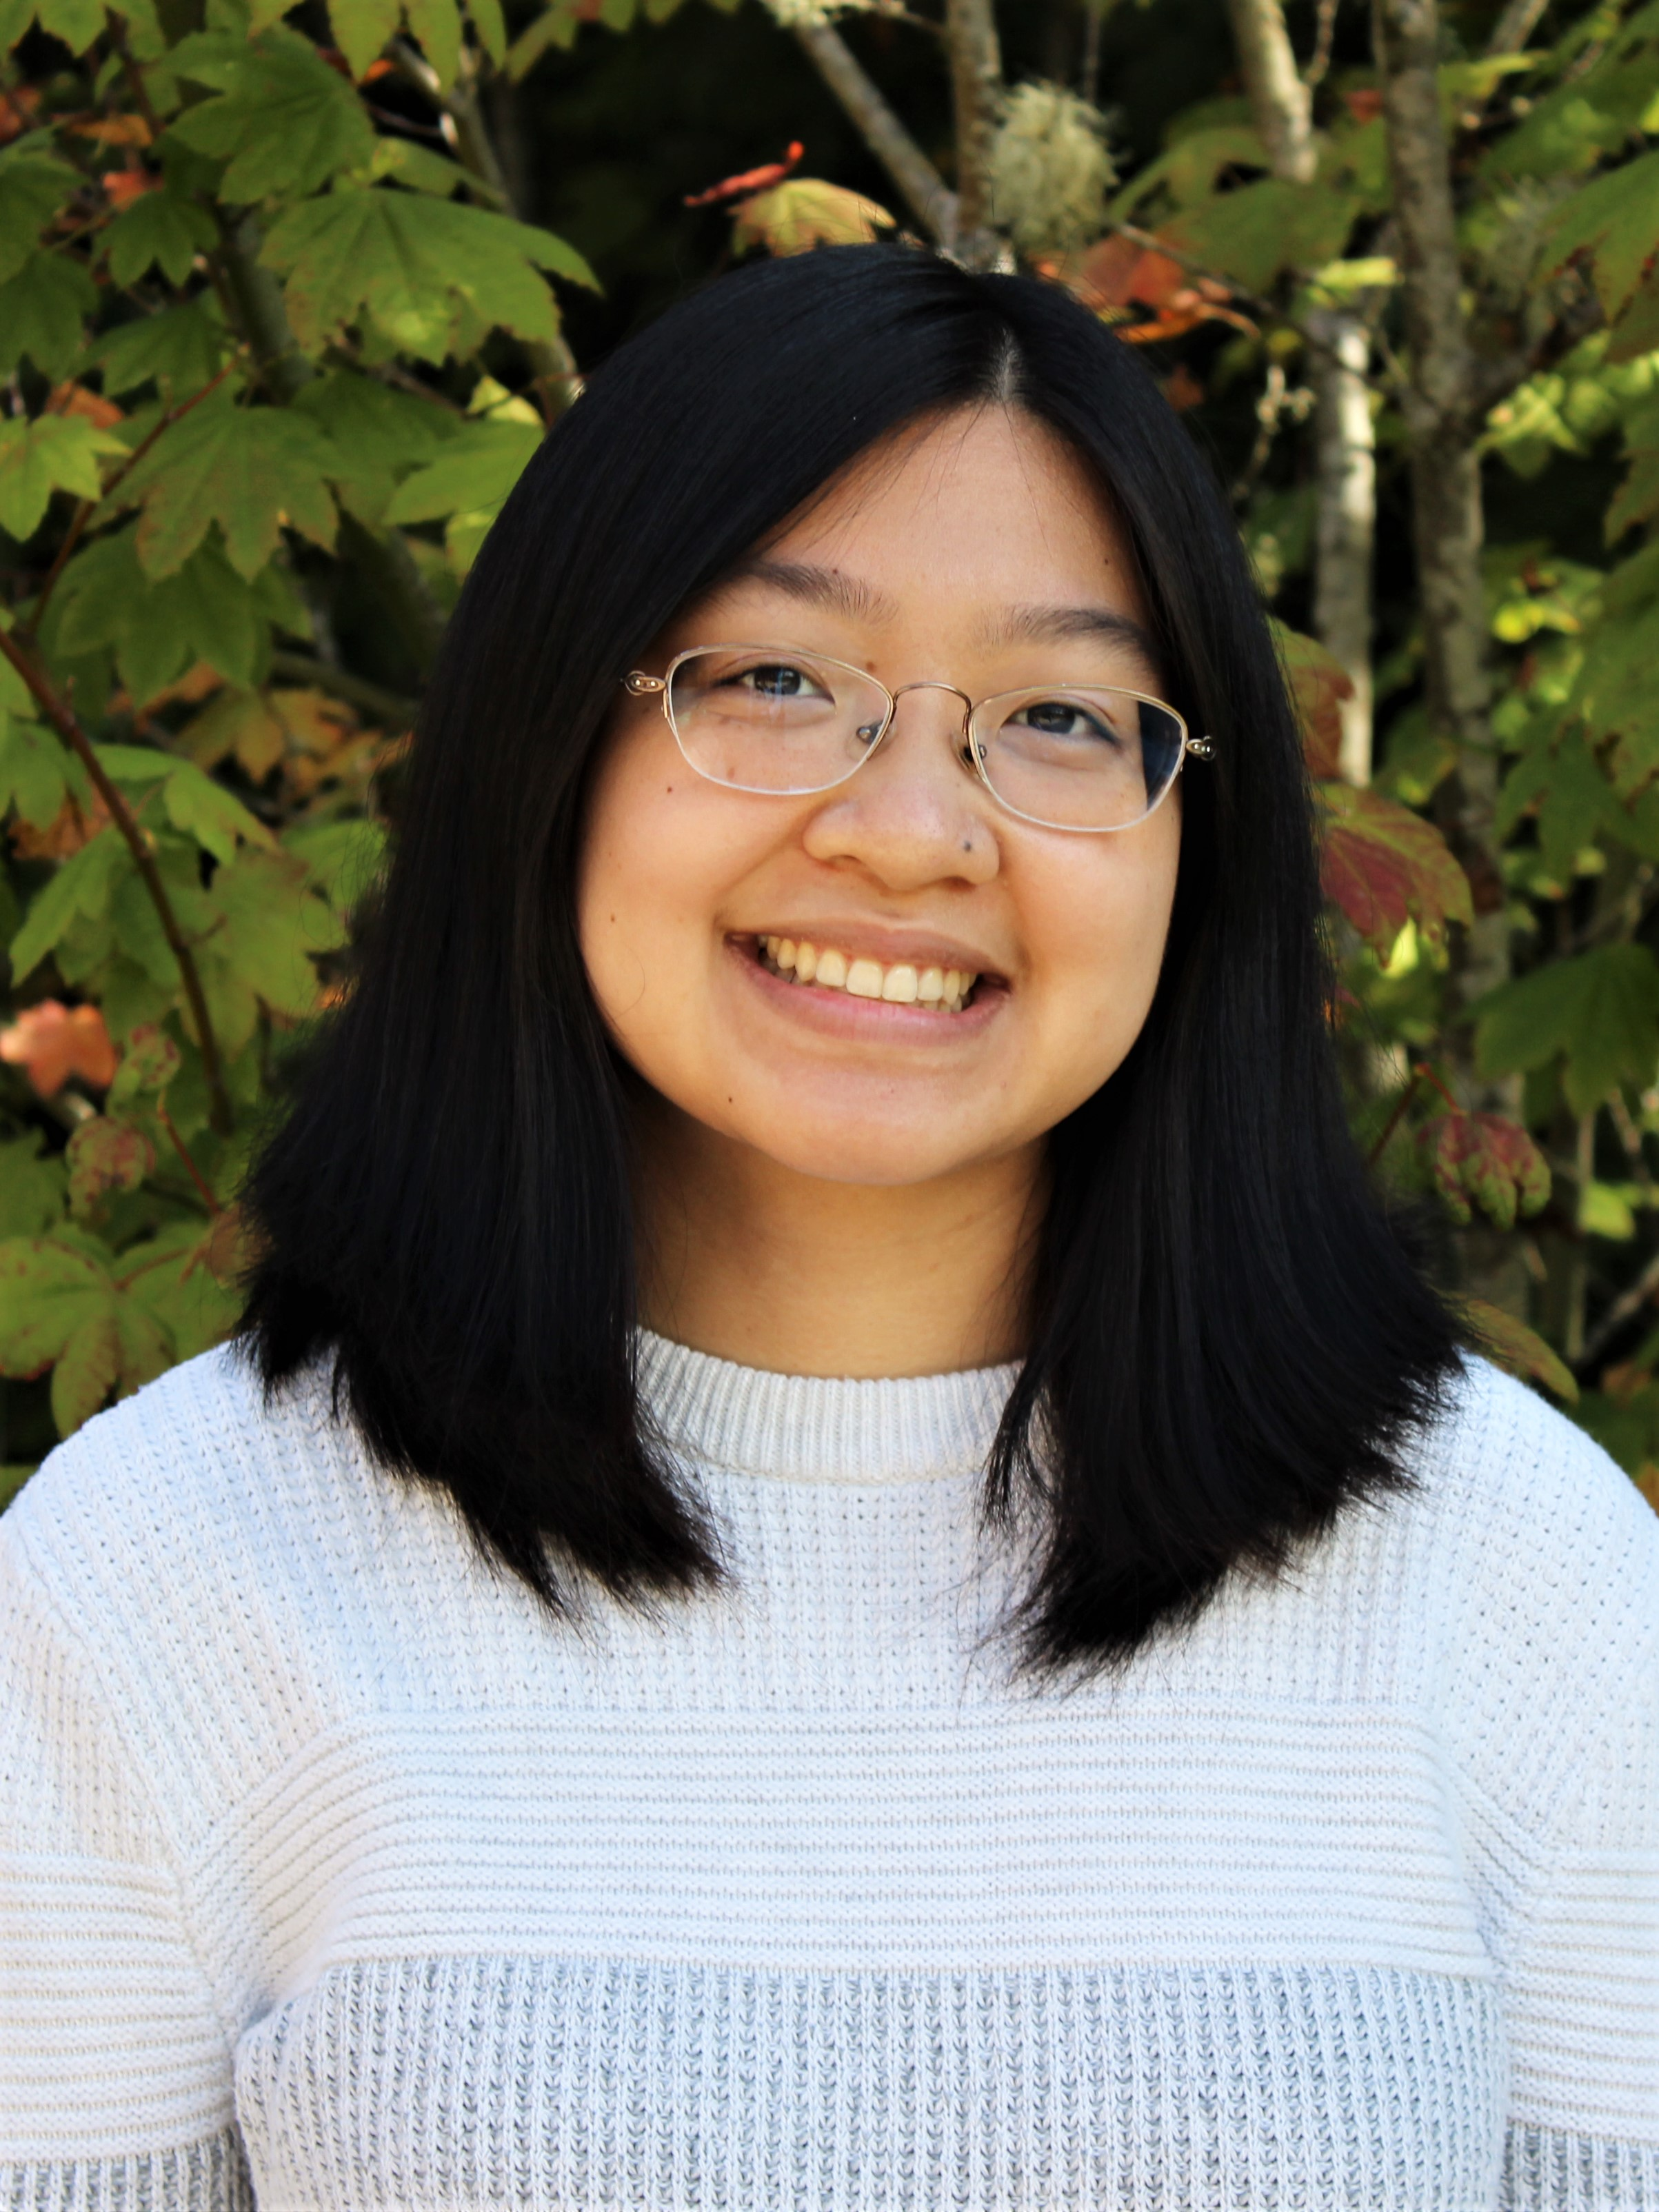 IslandWood Graduate Program student June Pen